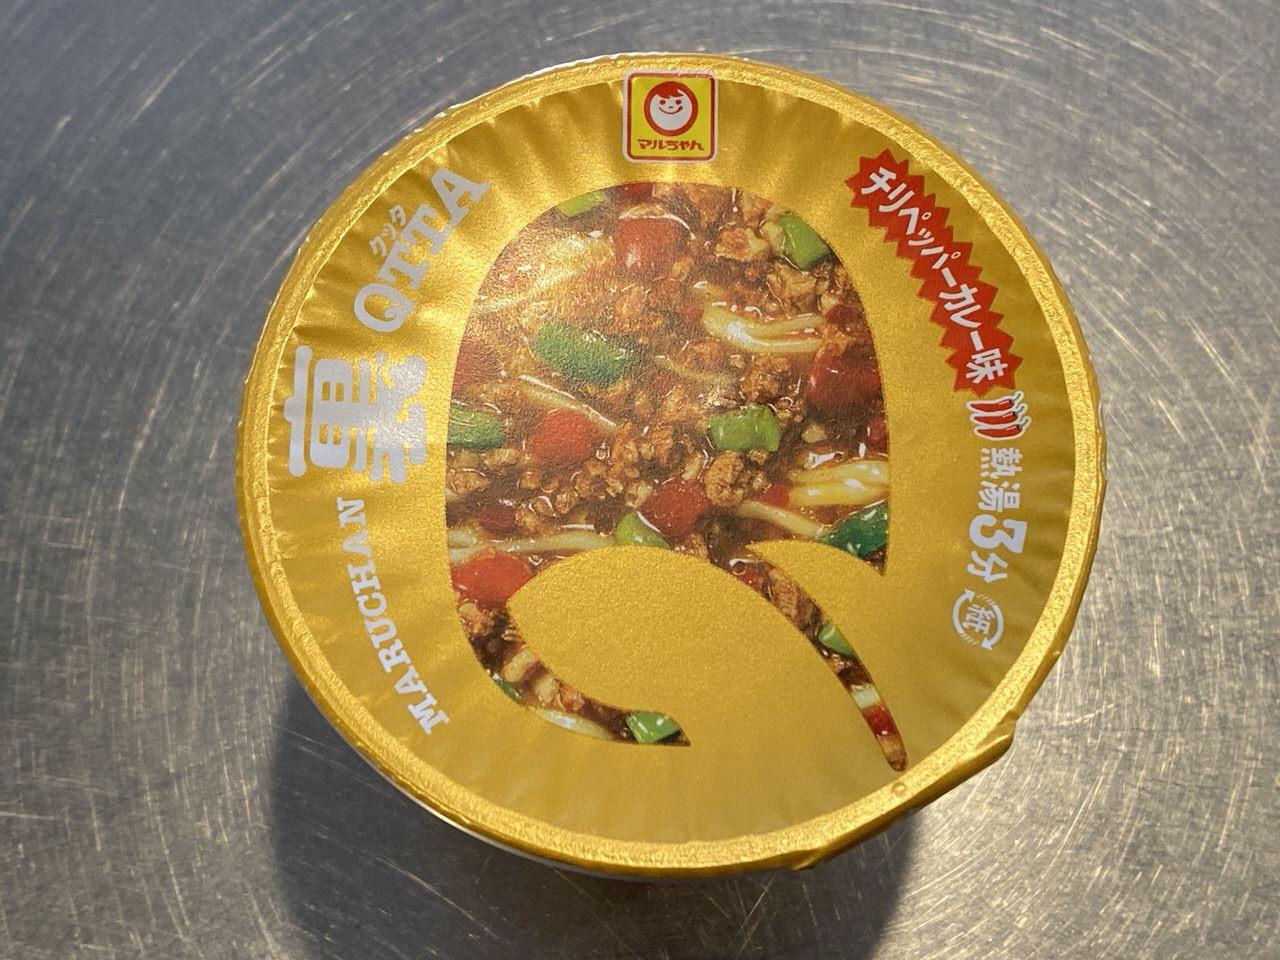 「QTTA裏 チリペッパーカレー味」想定外の複雑なスパイス感が美味しかった